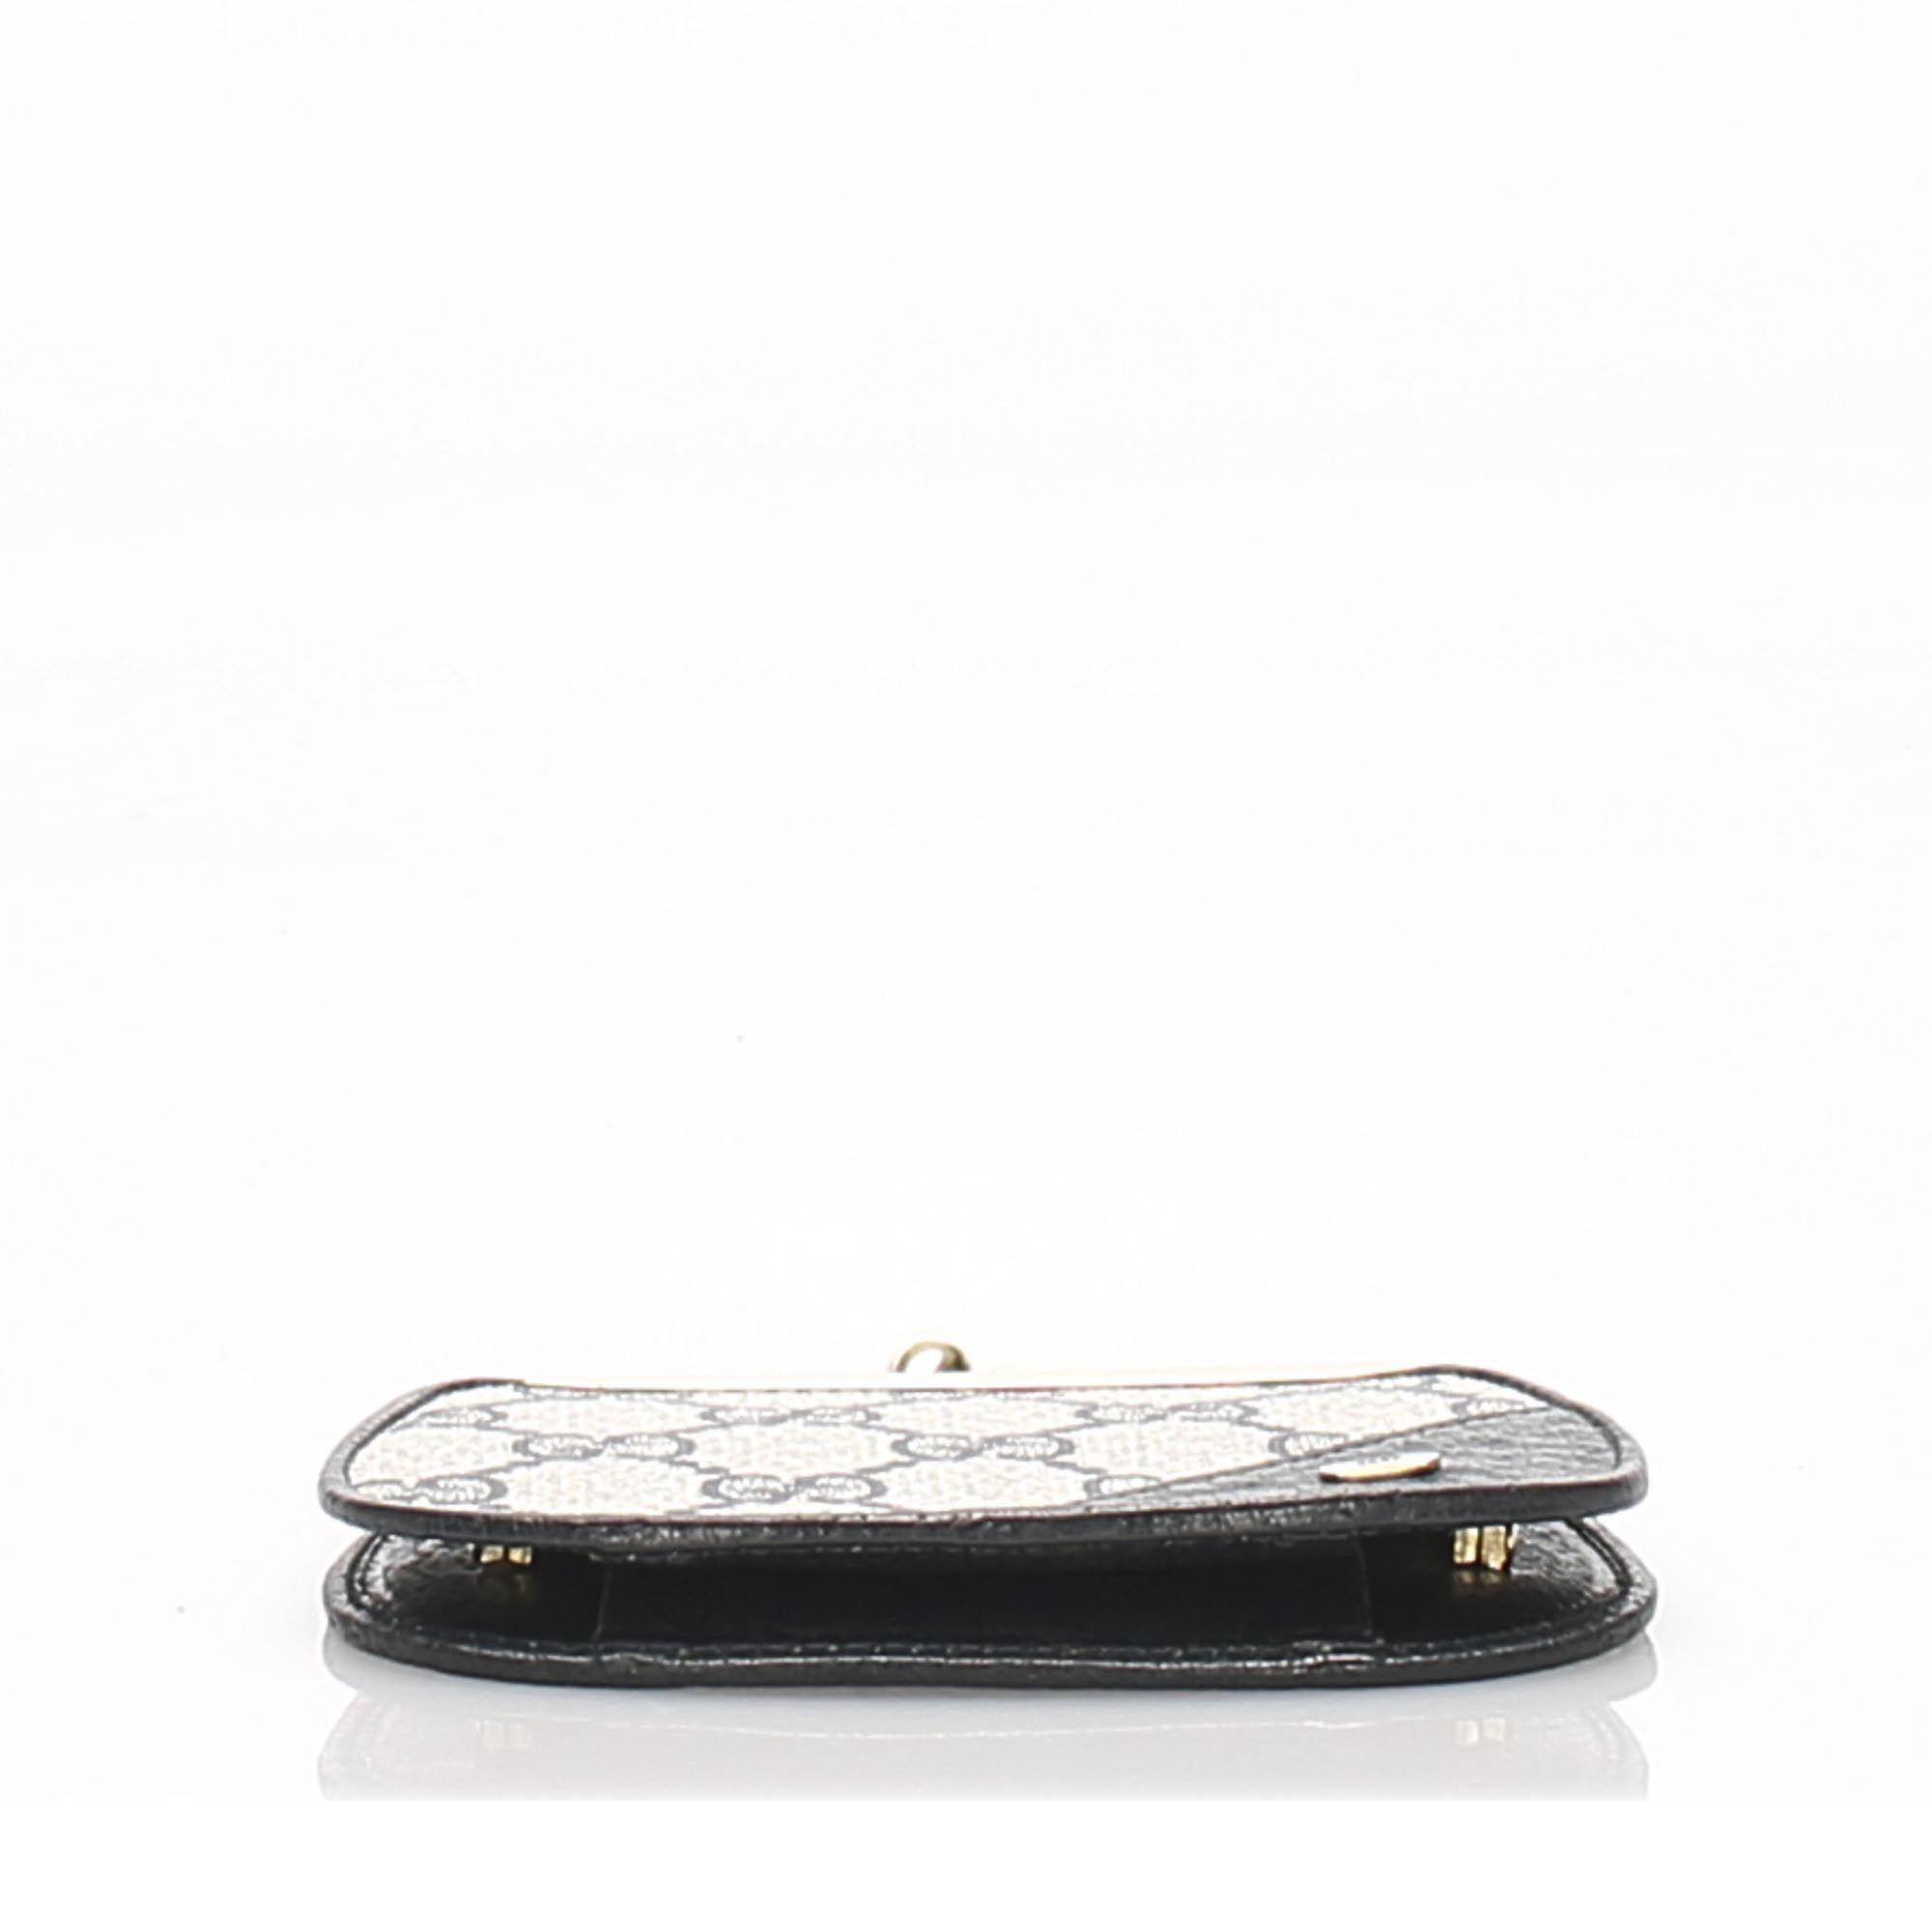 Vintage Gucci GG Supreme Coin Pouch Gray